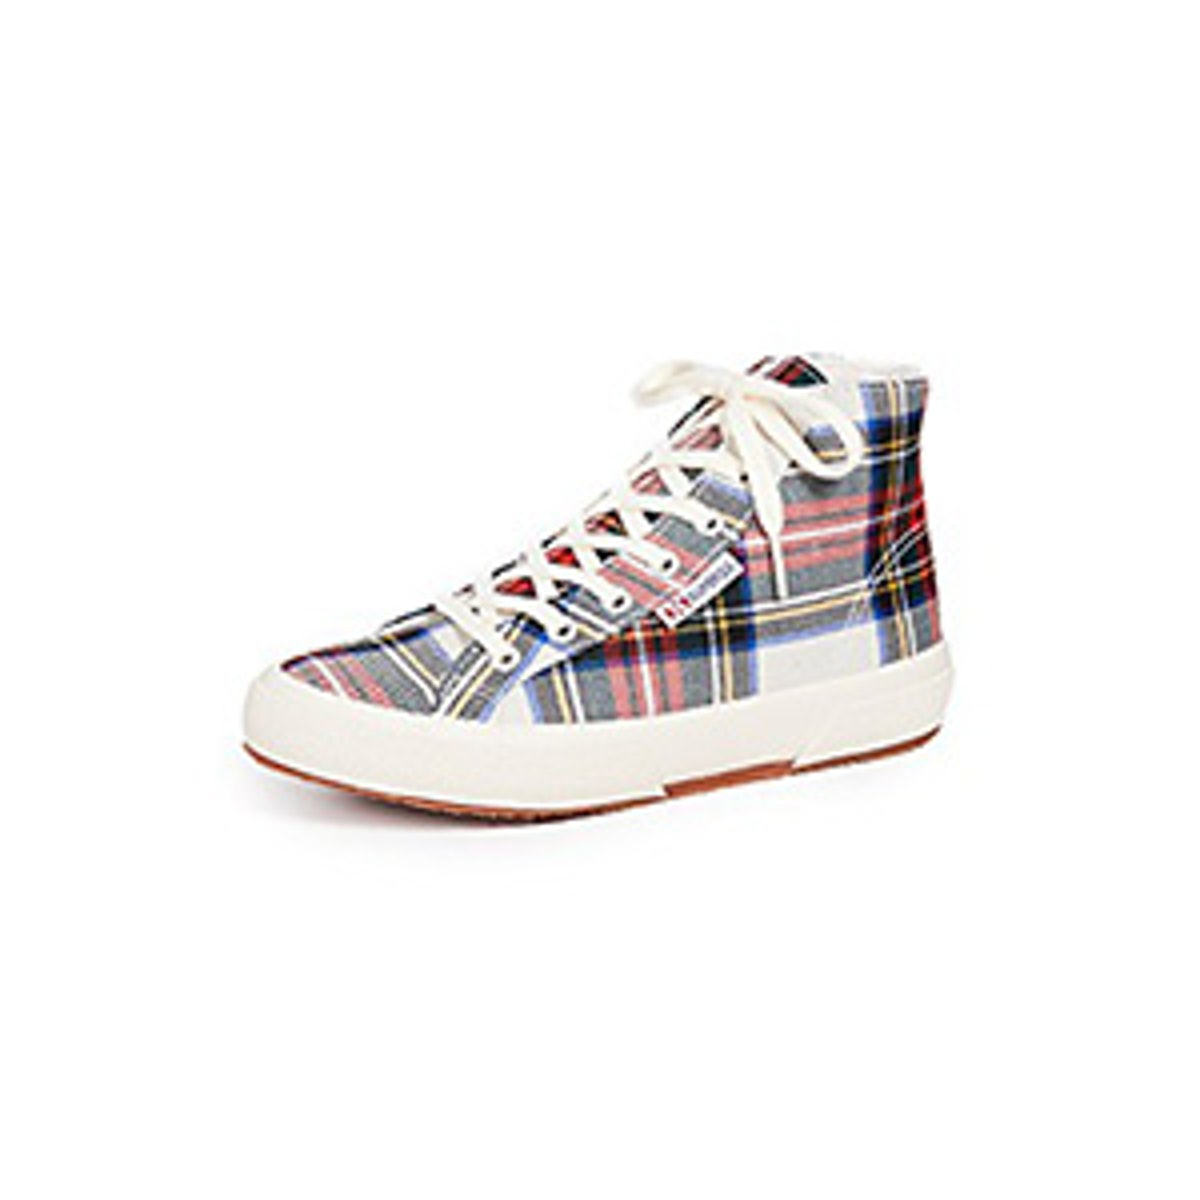 2795 Tartan High Top Sneakers